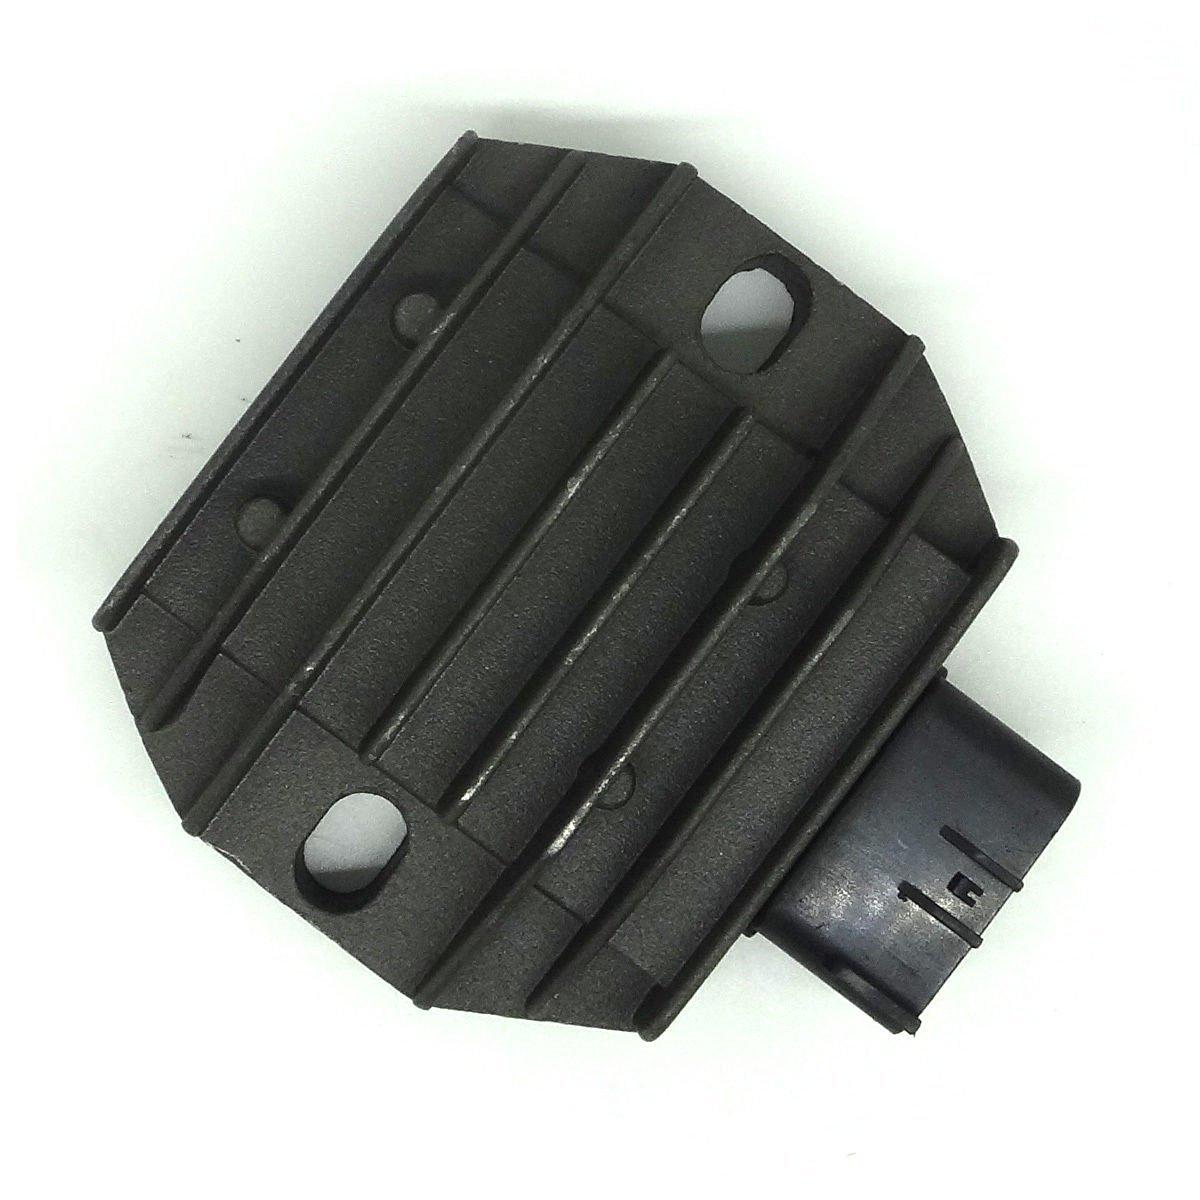 Conpus Regulator Rectifier fit Yamaha SH640D-12 SH640E-11 31600-HM8-013 Yamaha ATV YFM350 YFM 350 GRIZZLY 2007-2008